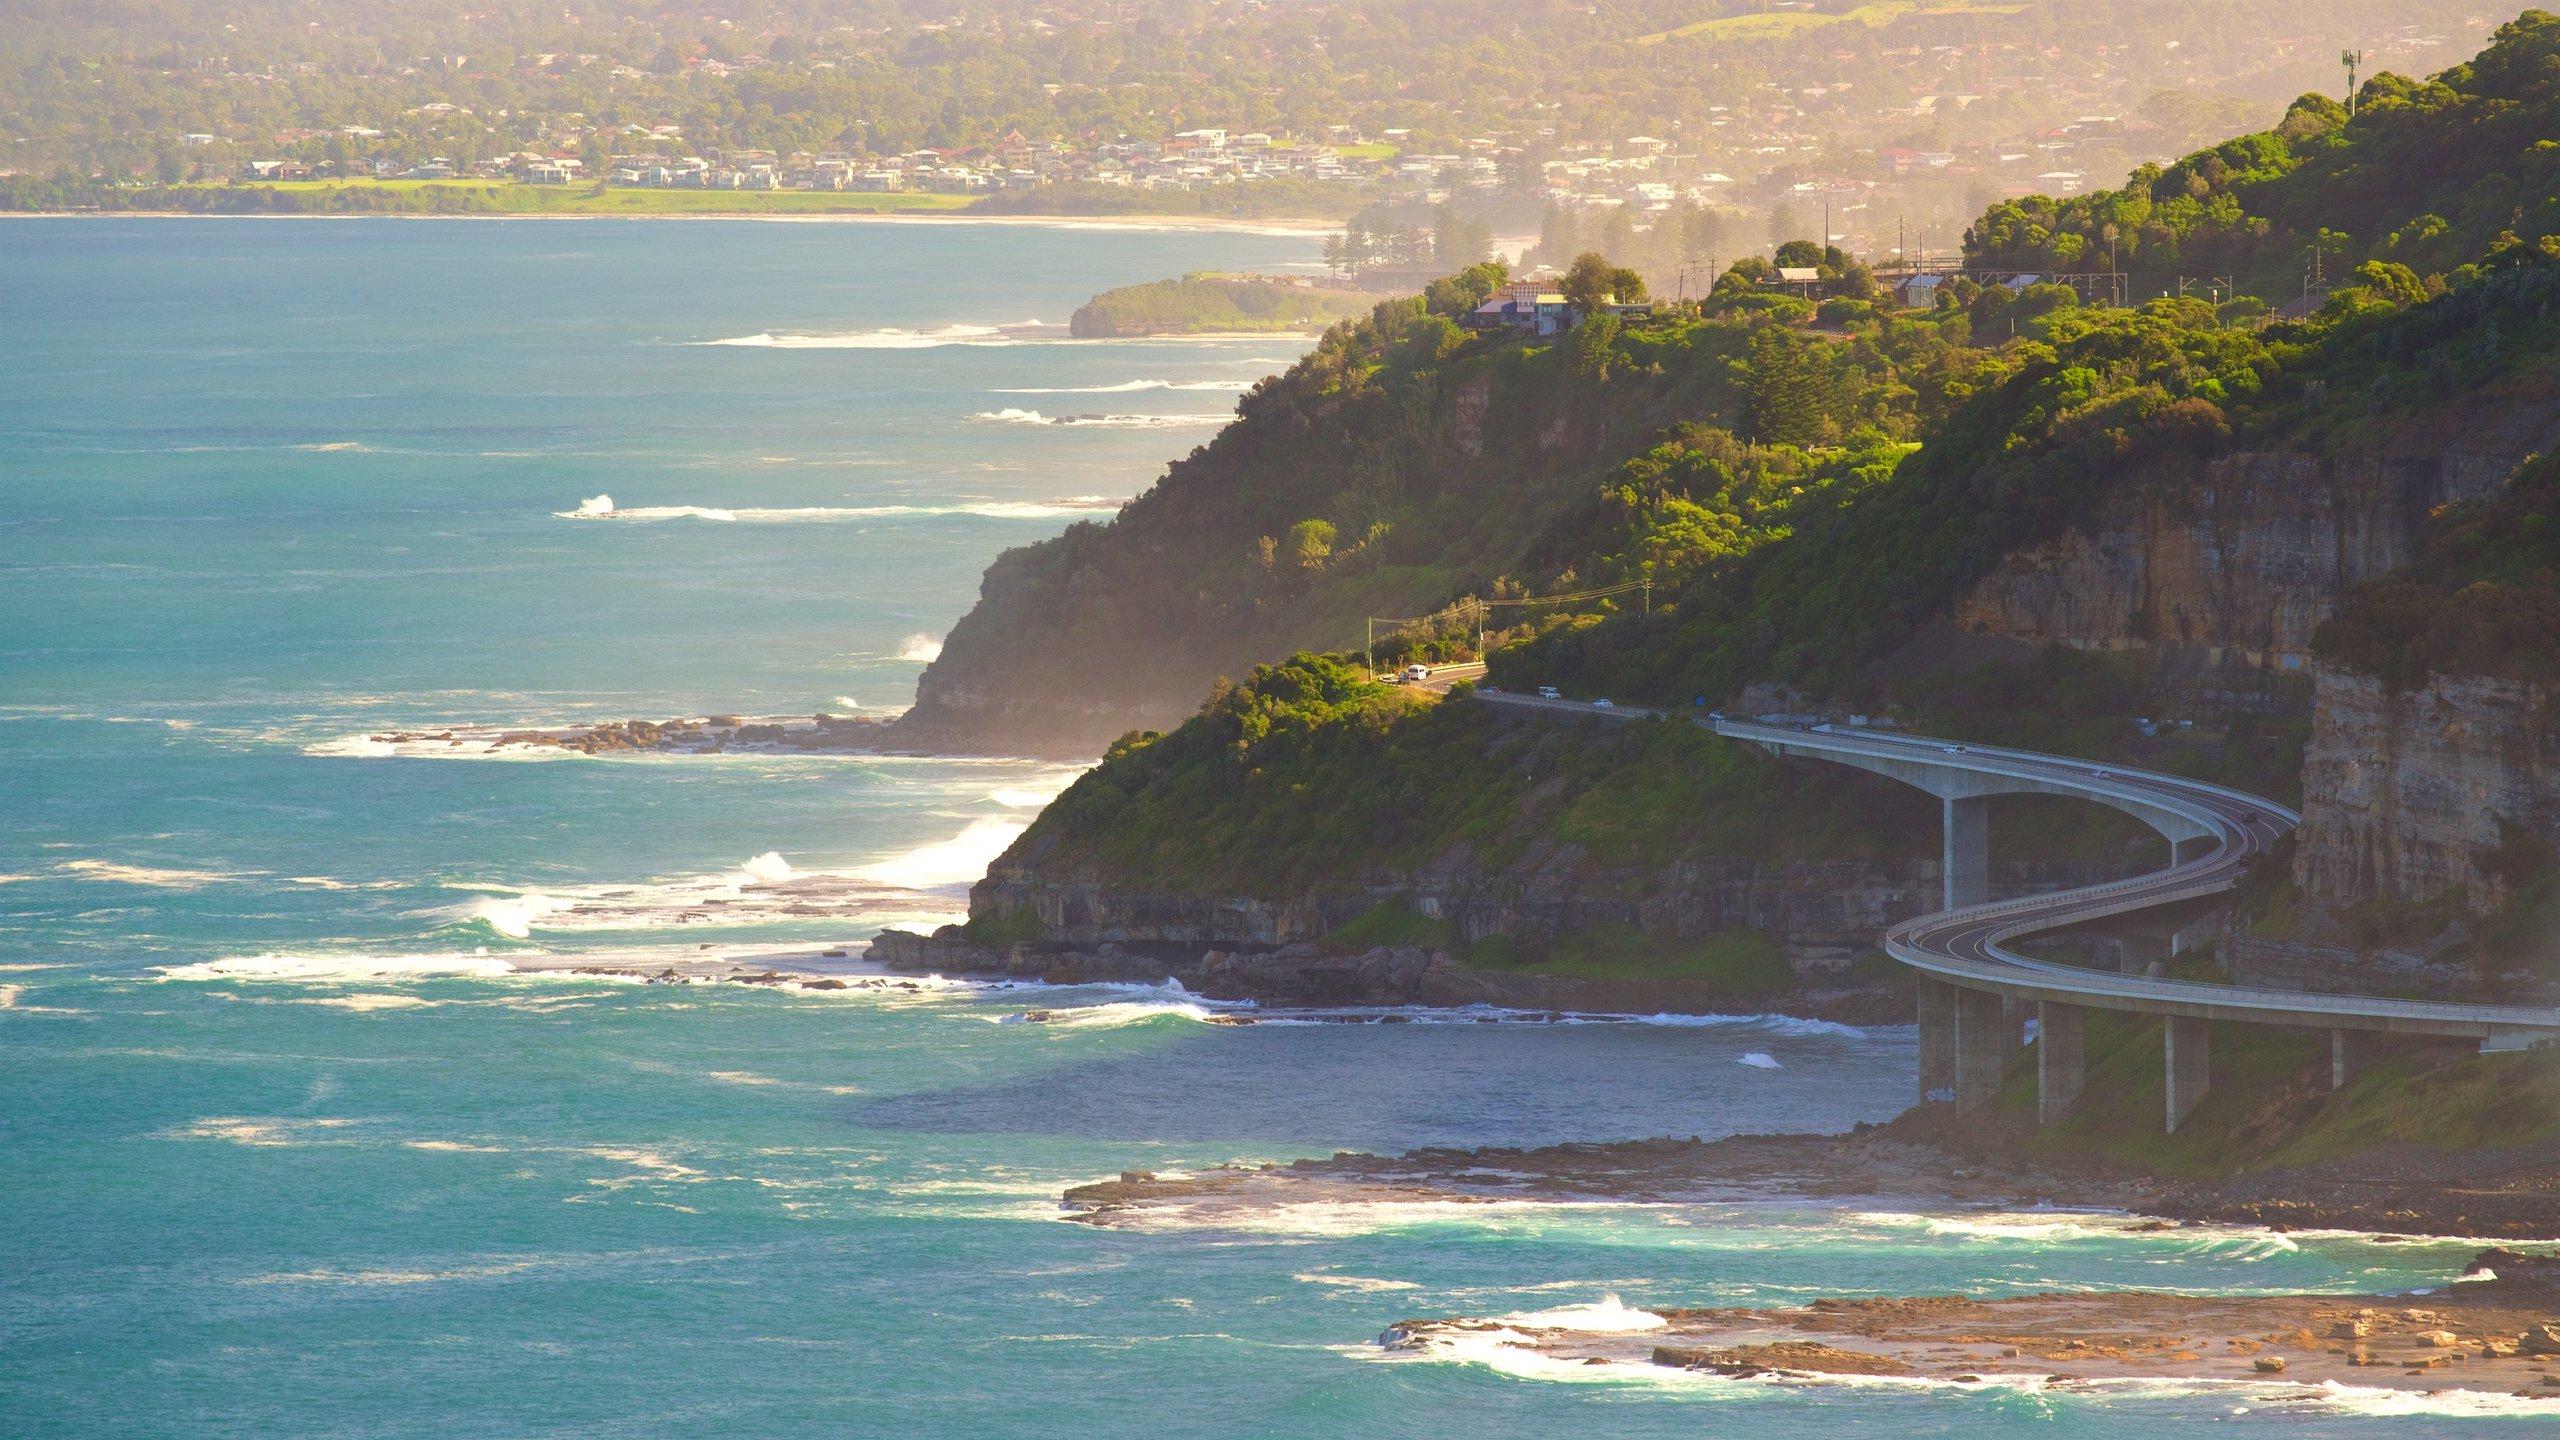 Sea Cliff Bridge, Wollongong, New South Wales, Australia